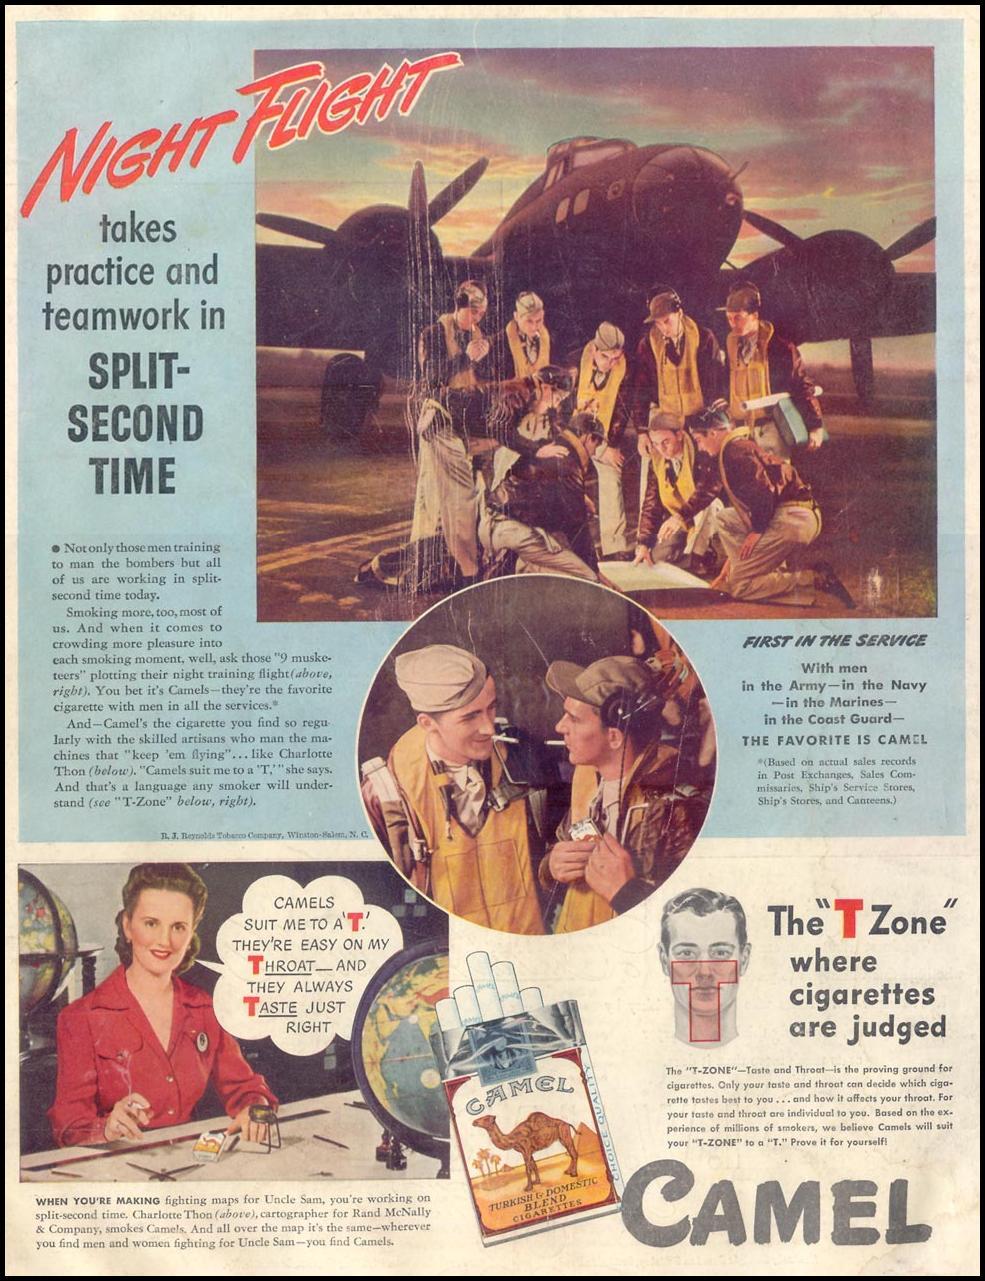 CAMEL CIGARETTES LIFE 11/30/1942 BACK COVER